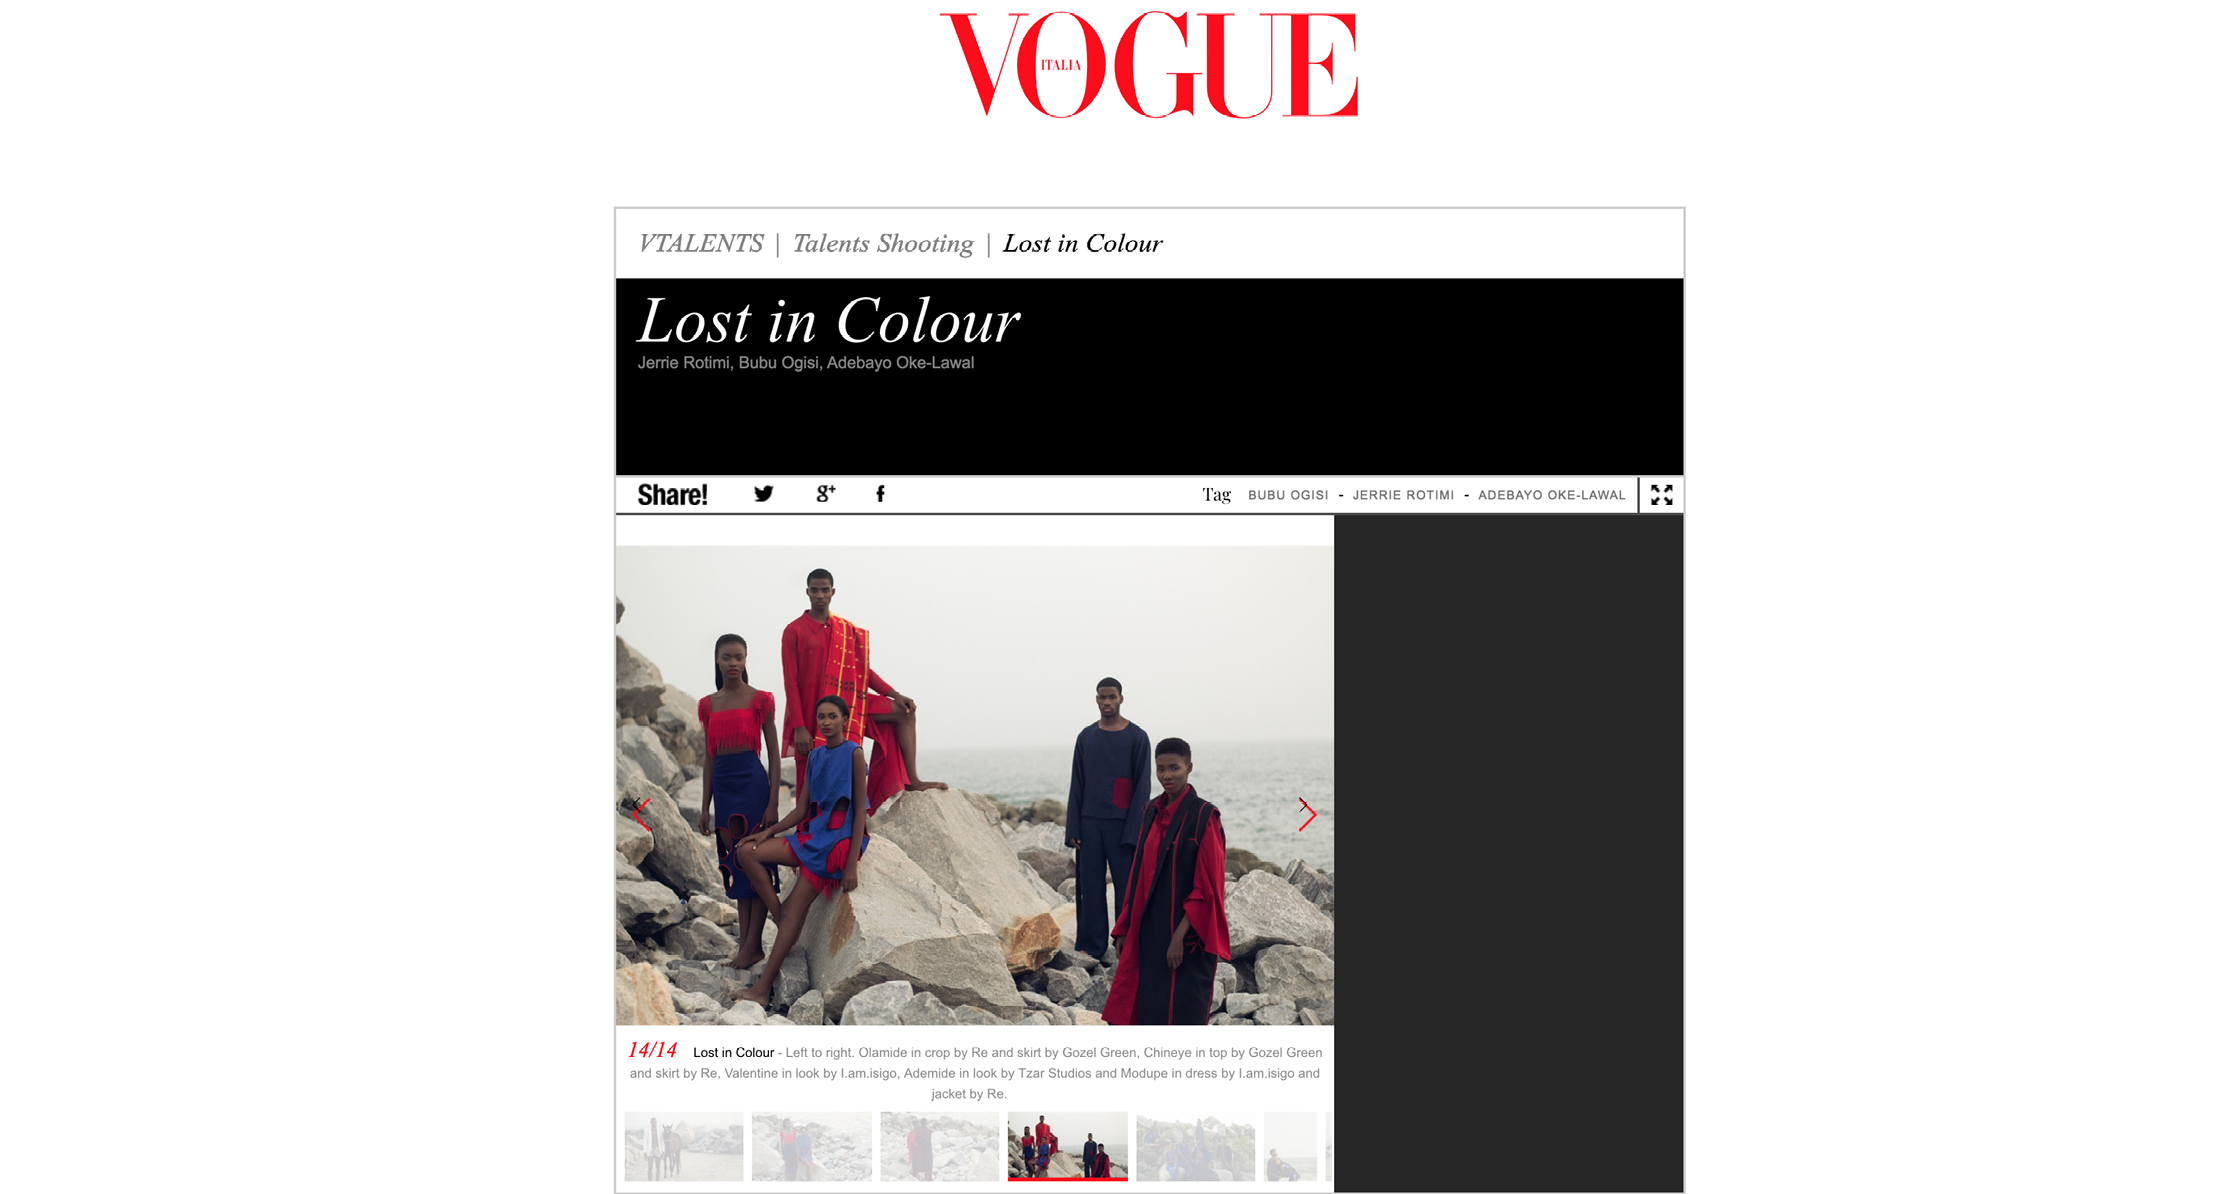 Kenneth Ize Vogue Italia African Talents. Lost in Colour. Jerrie Rotimi Bubu Ogisi Adebayo Oke-Lawal